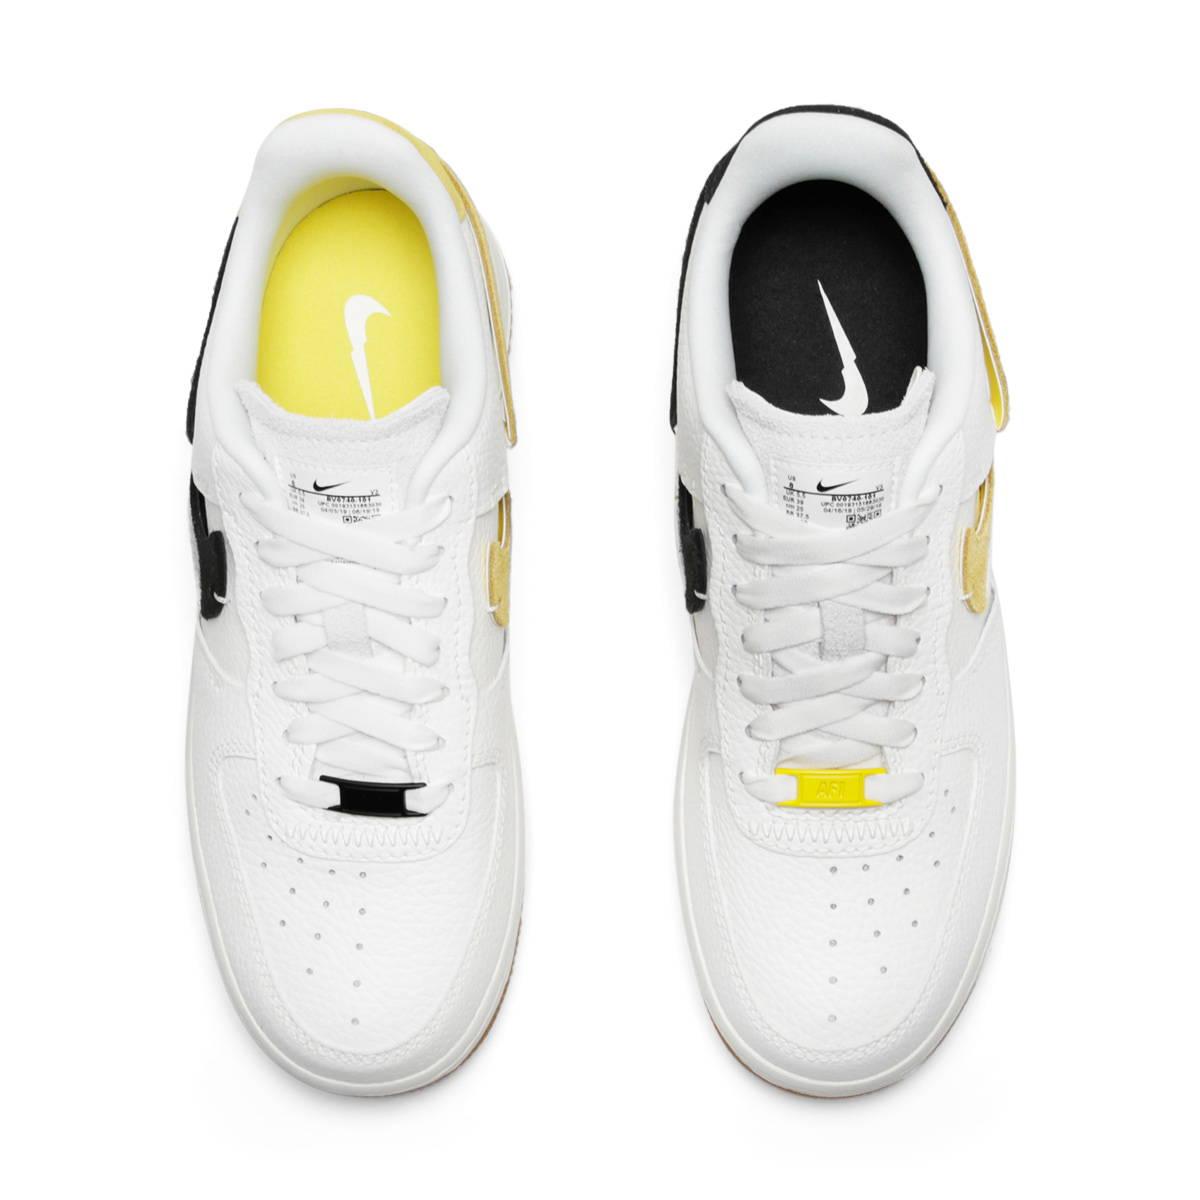 10119: Nike Women's Air Force 1 '07 LXX (QS) - Bodega